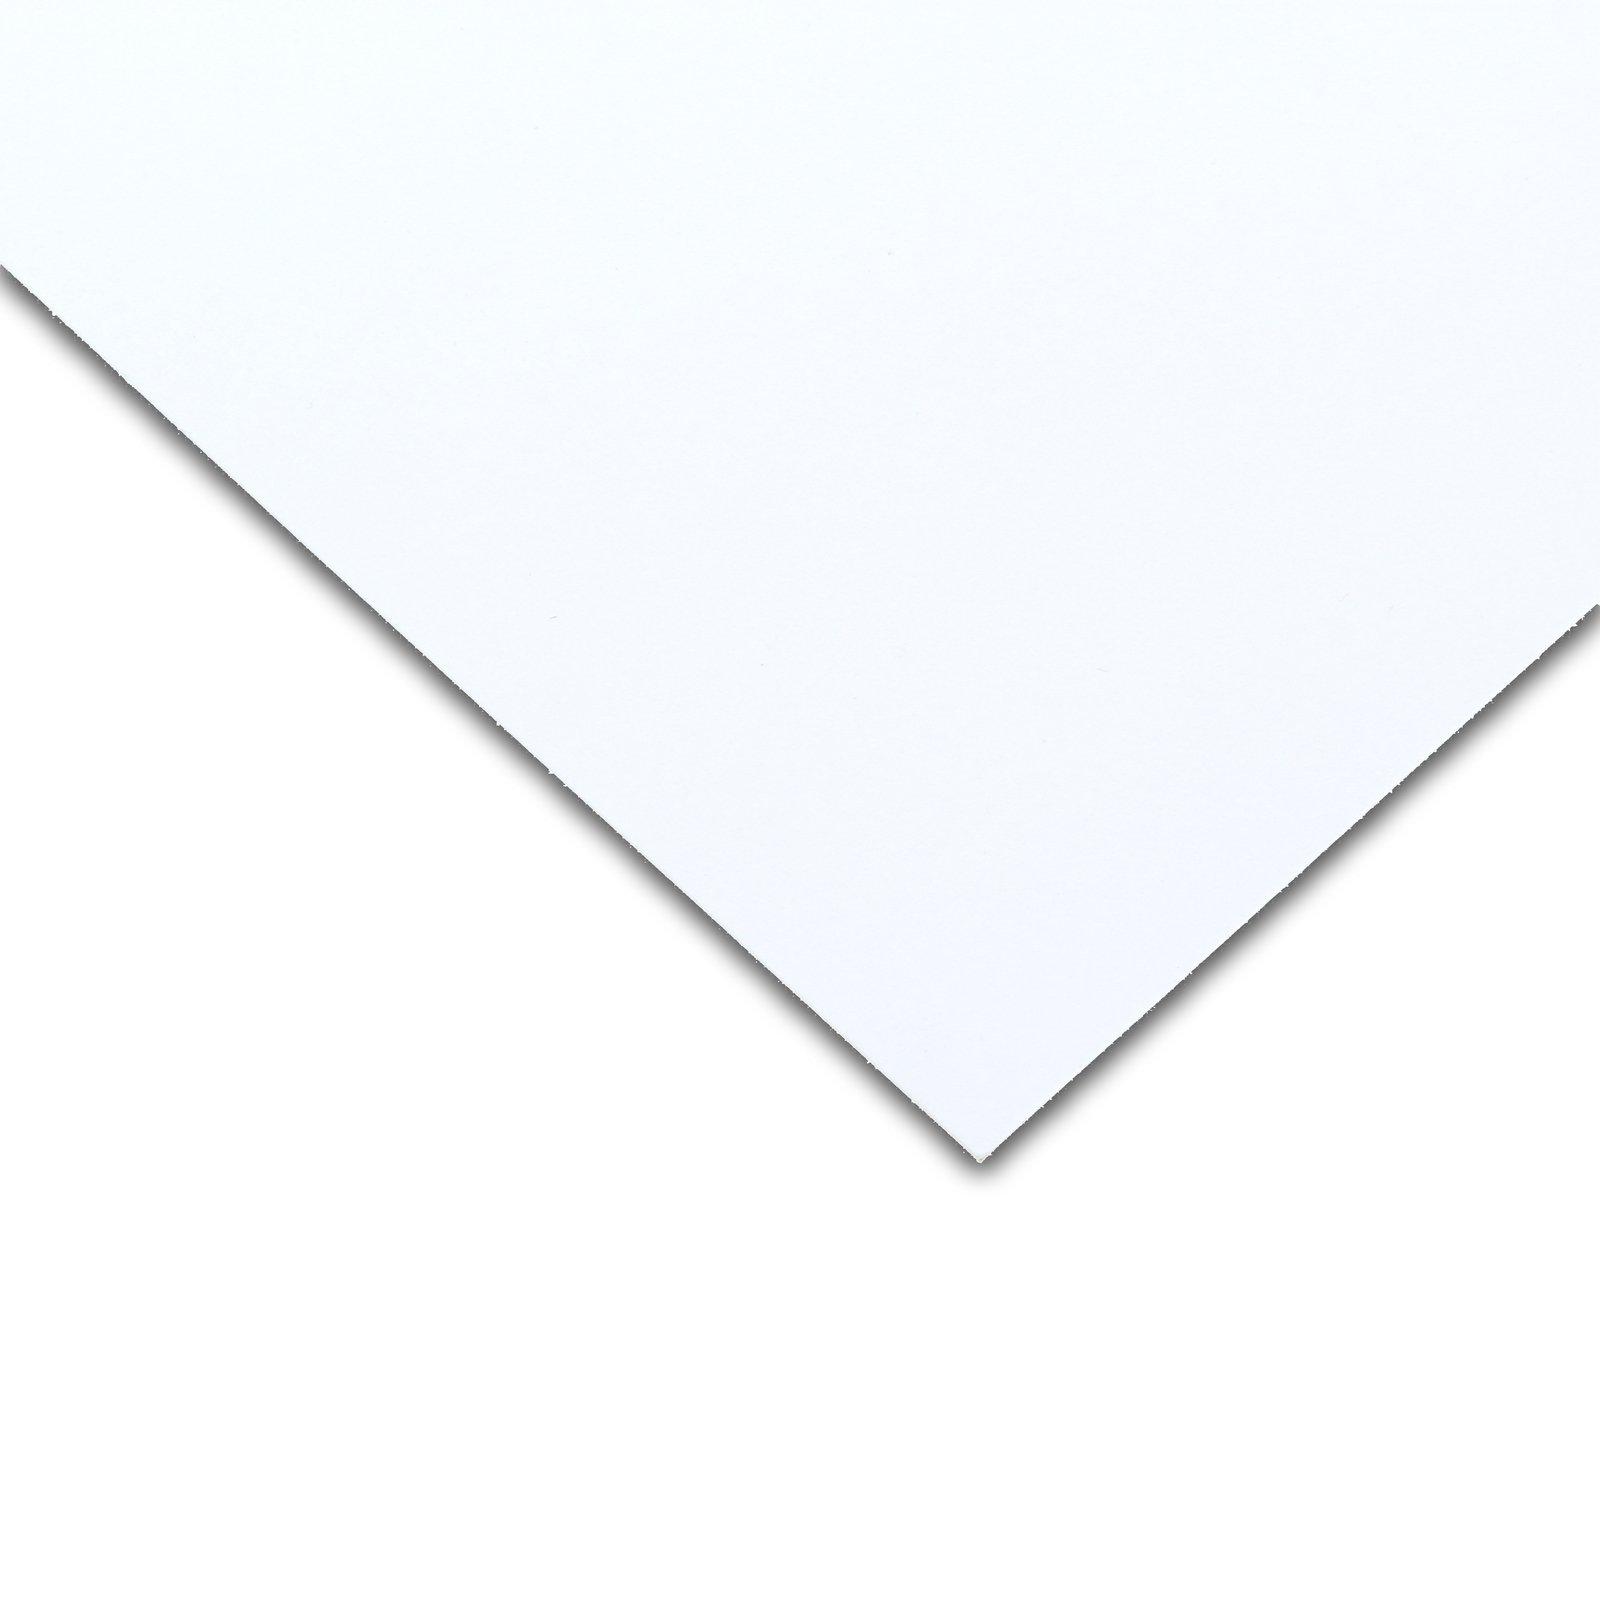 300 Series Smooth Bristol Sheets 22.5x28 - 2Ply